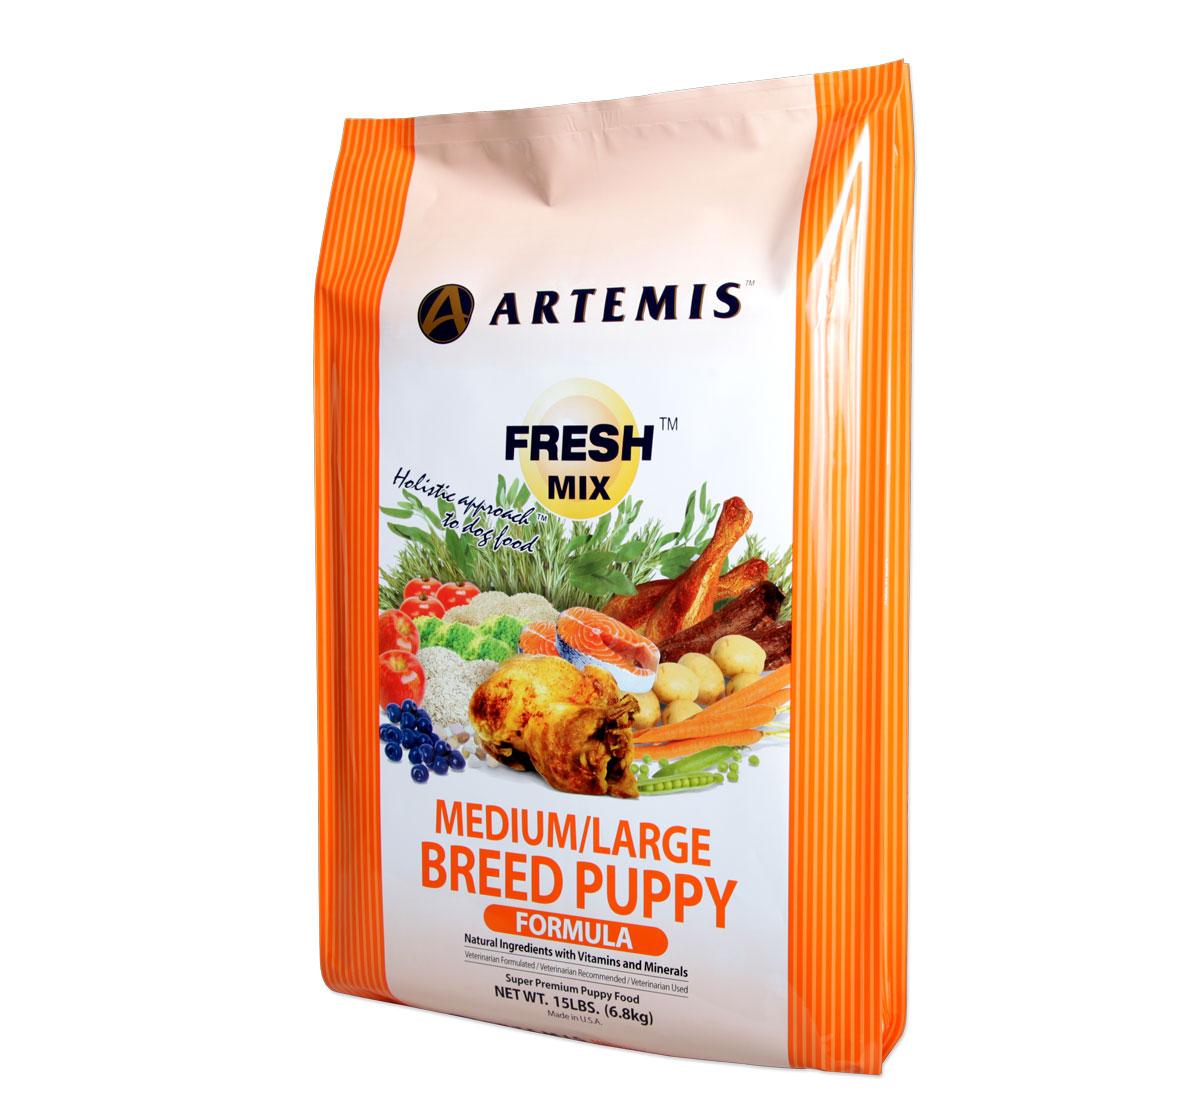 Artemis Small Breed Dog Food